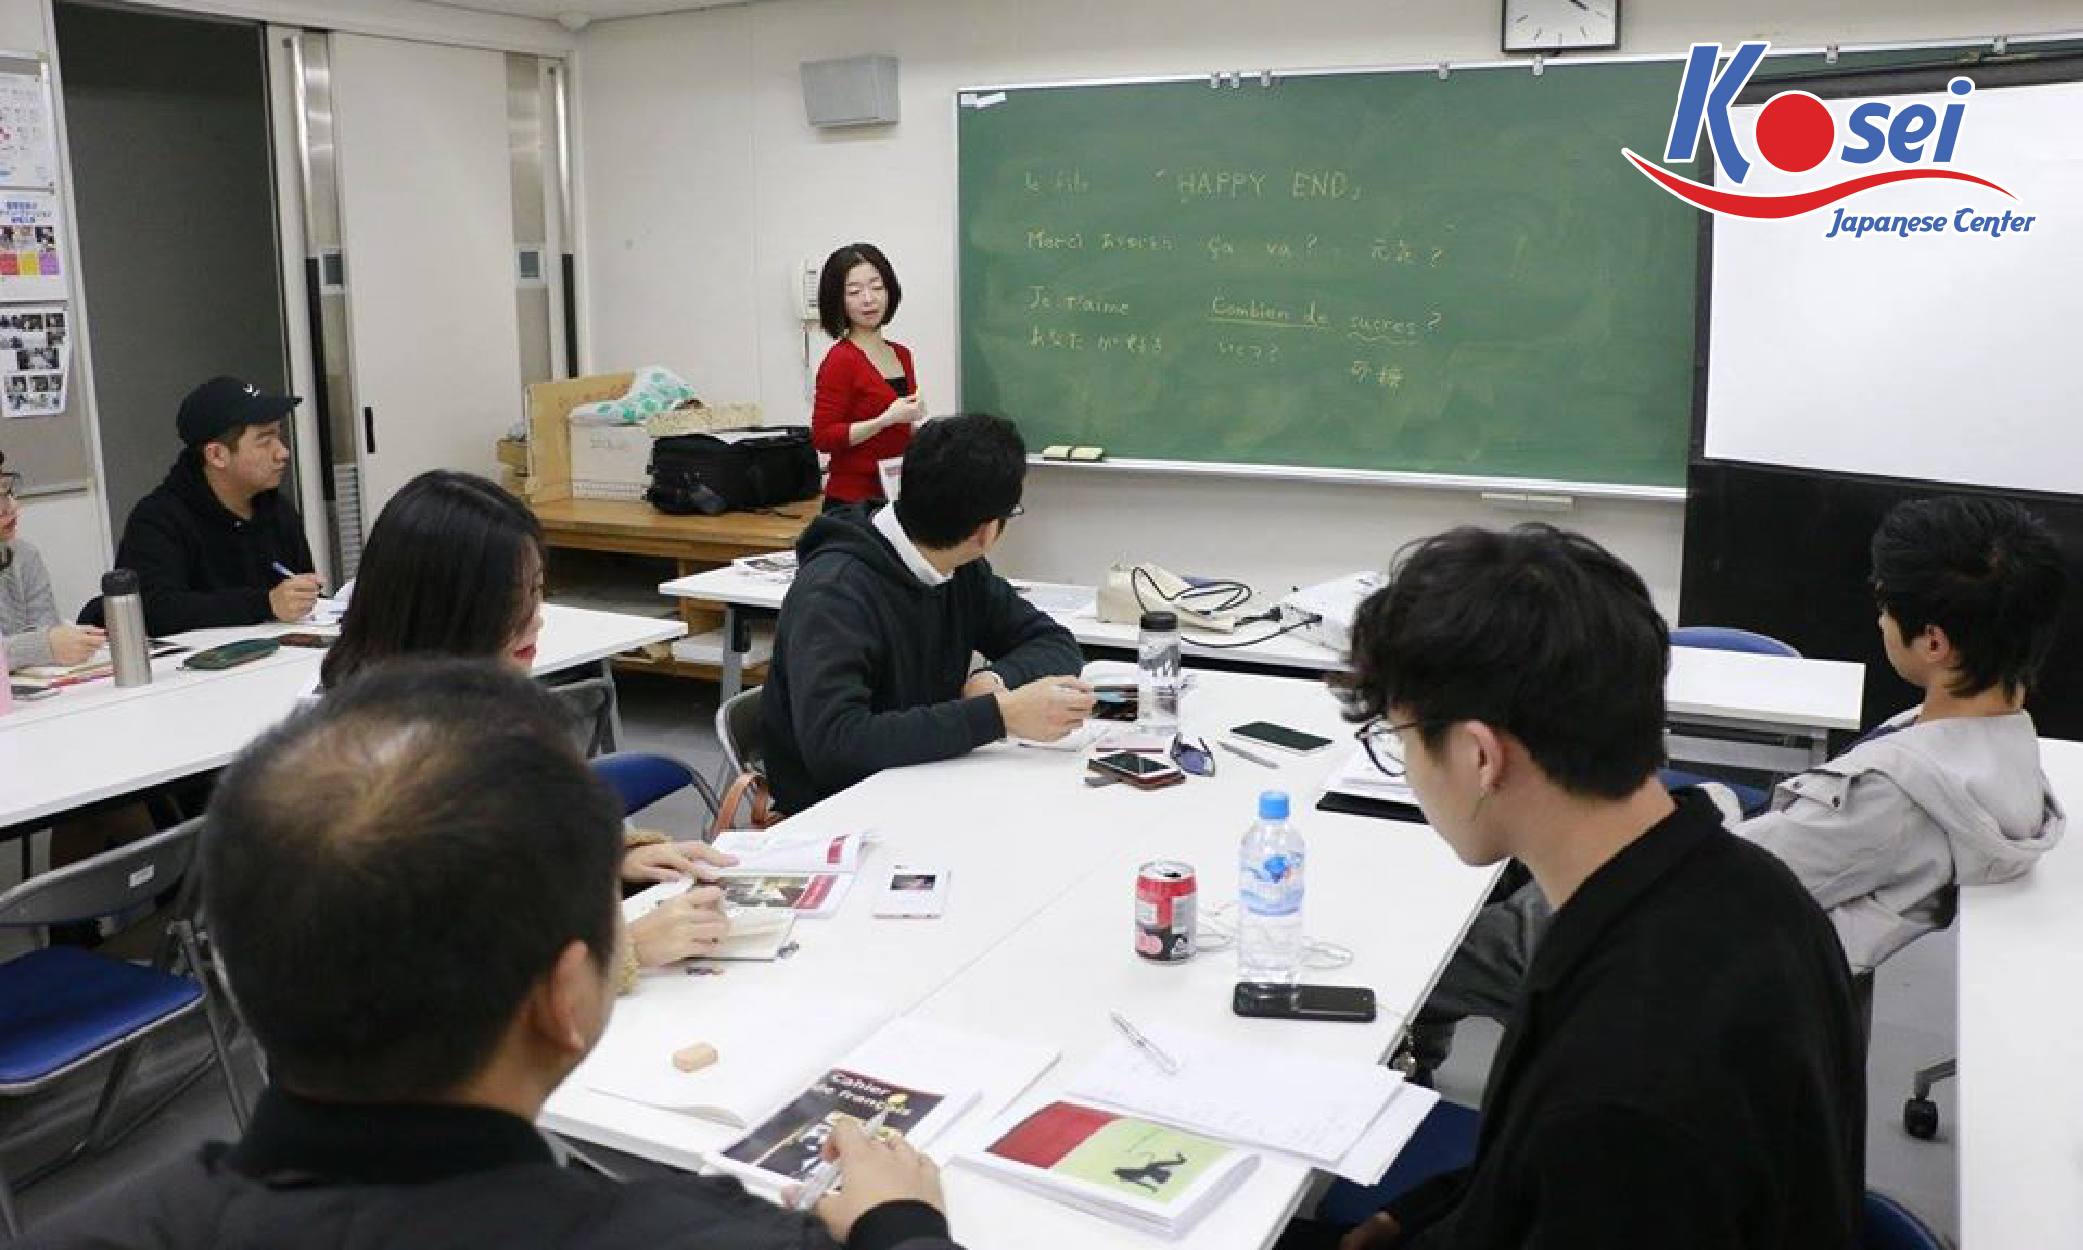 học viện thiết kế yokohama